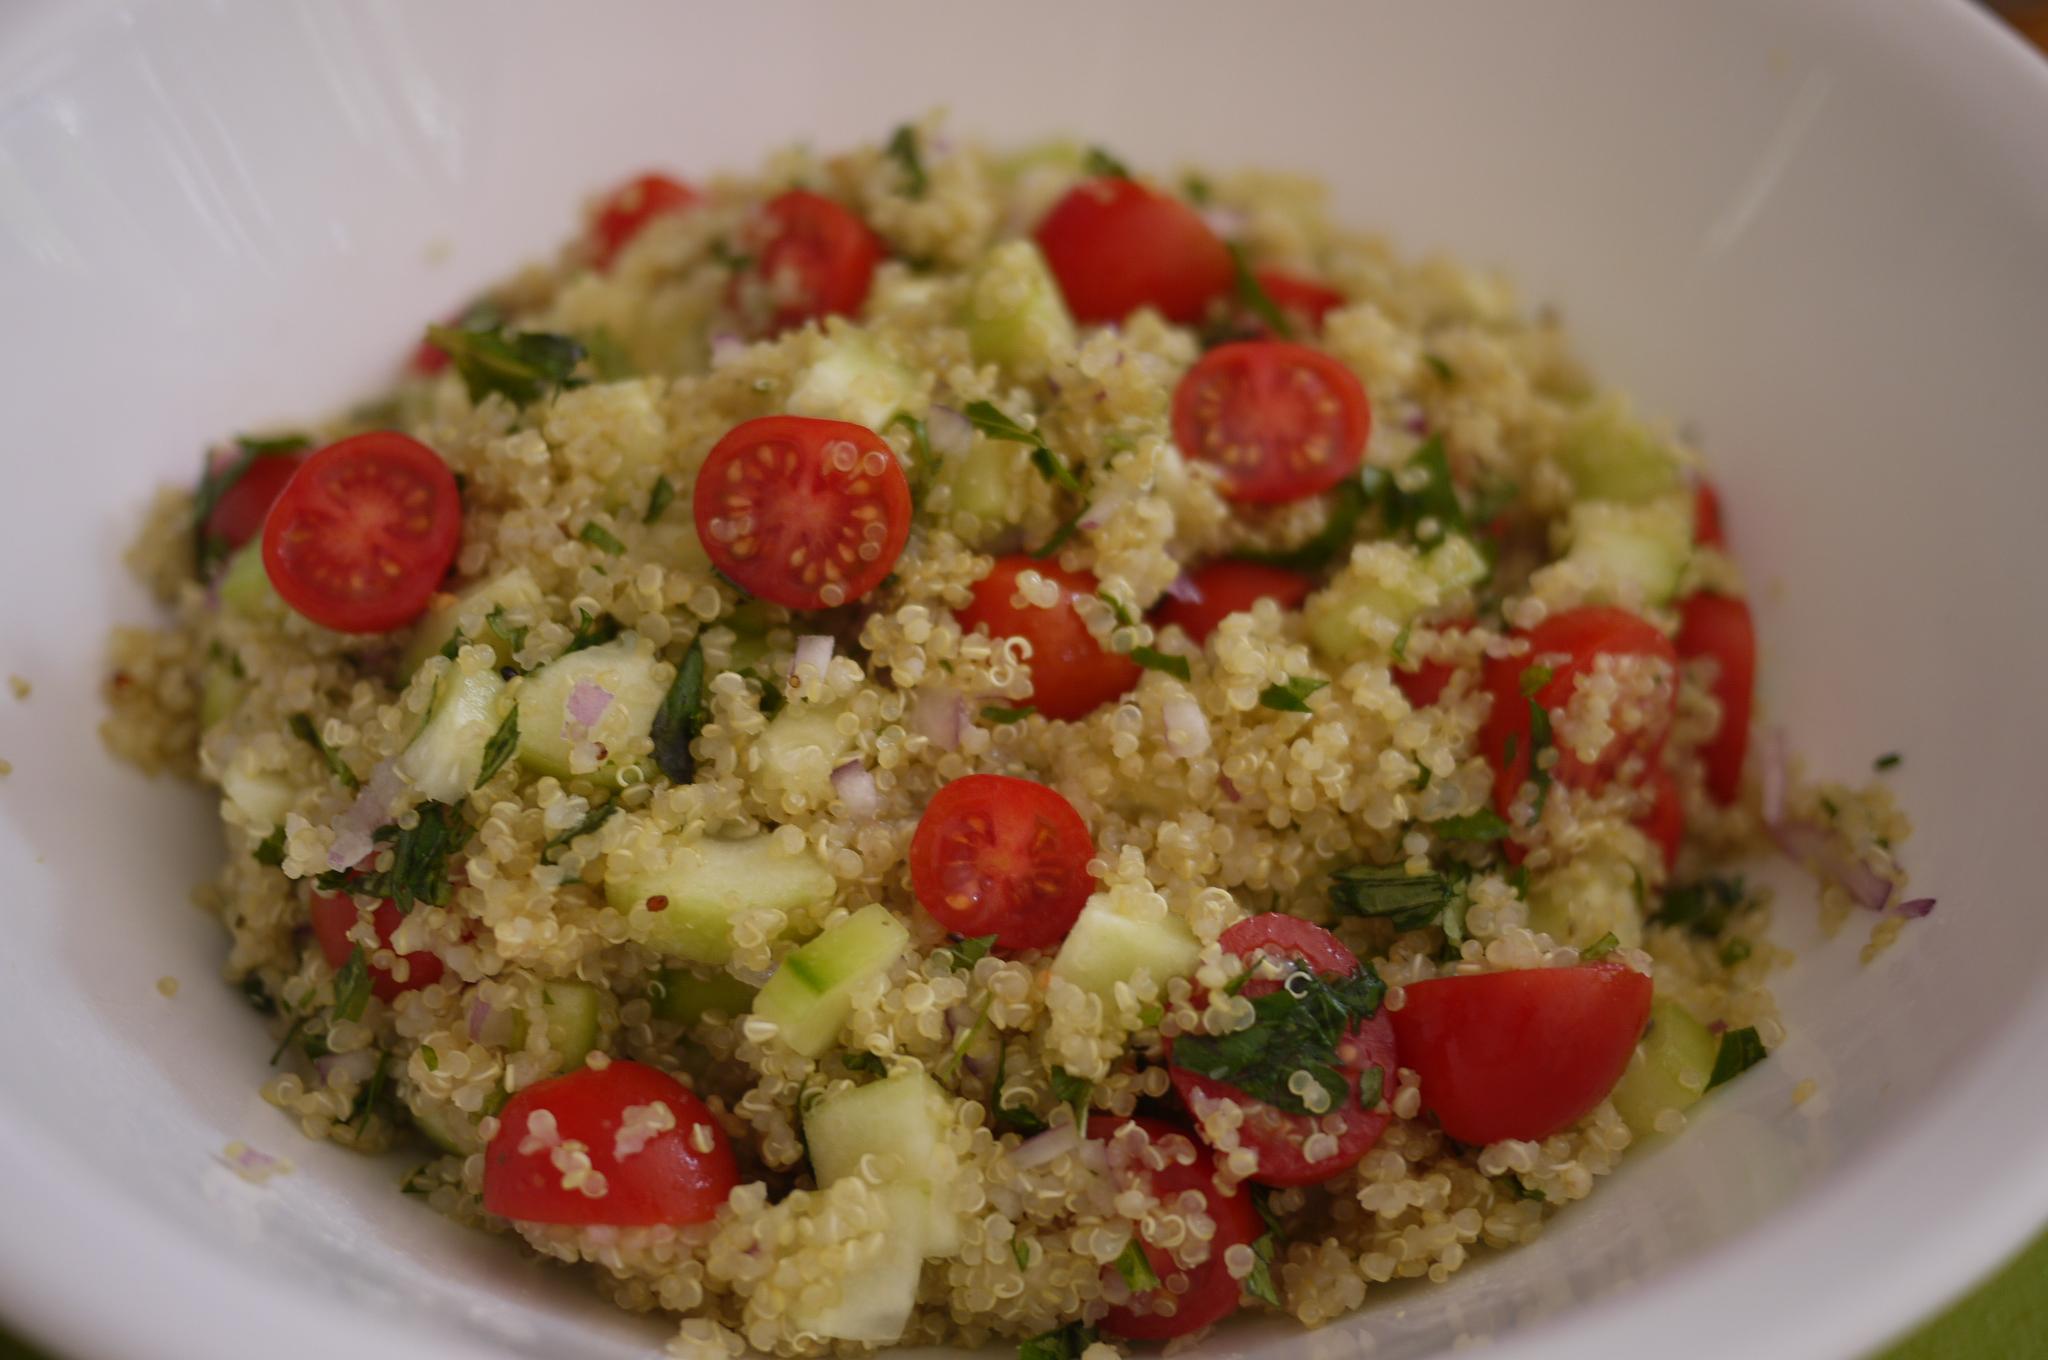 Tabule de quinoa the cute kitchen for Cocinar quinoa al vapor